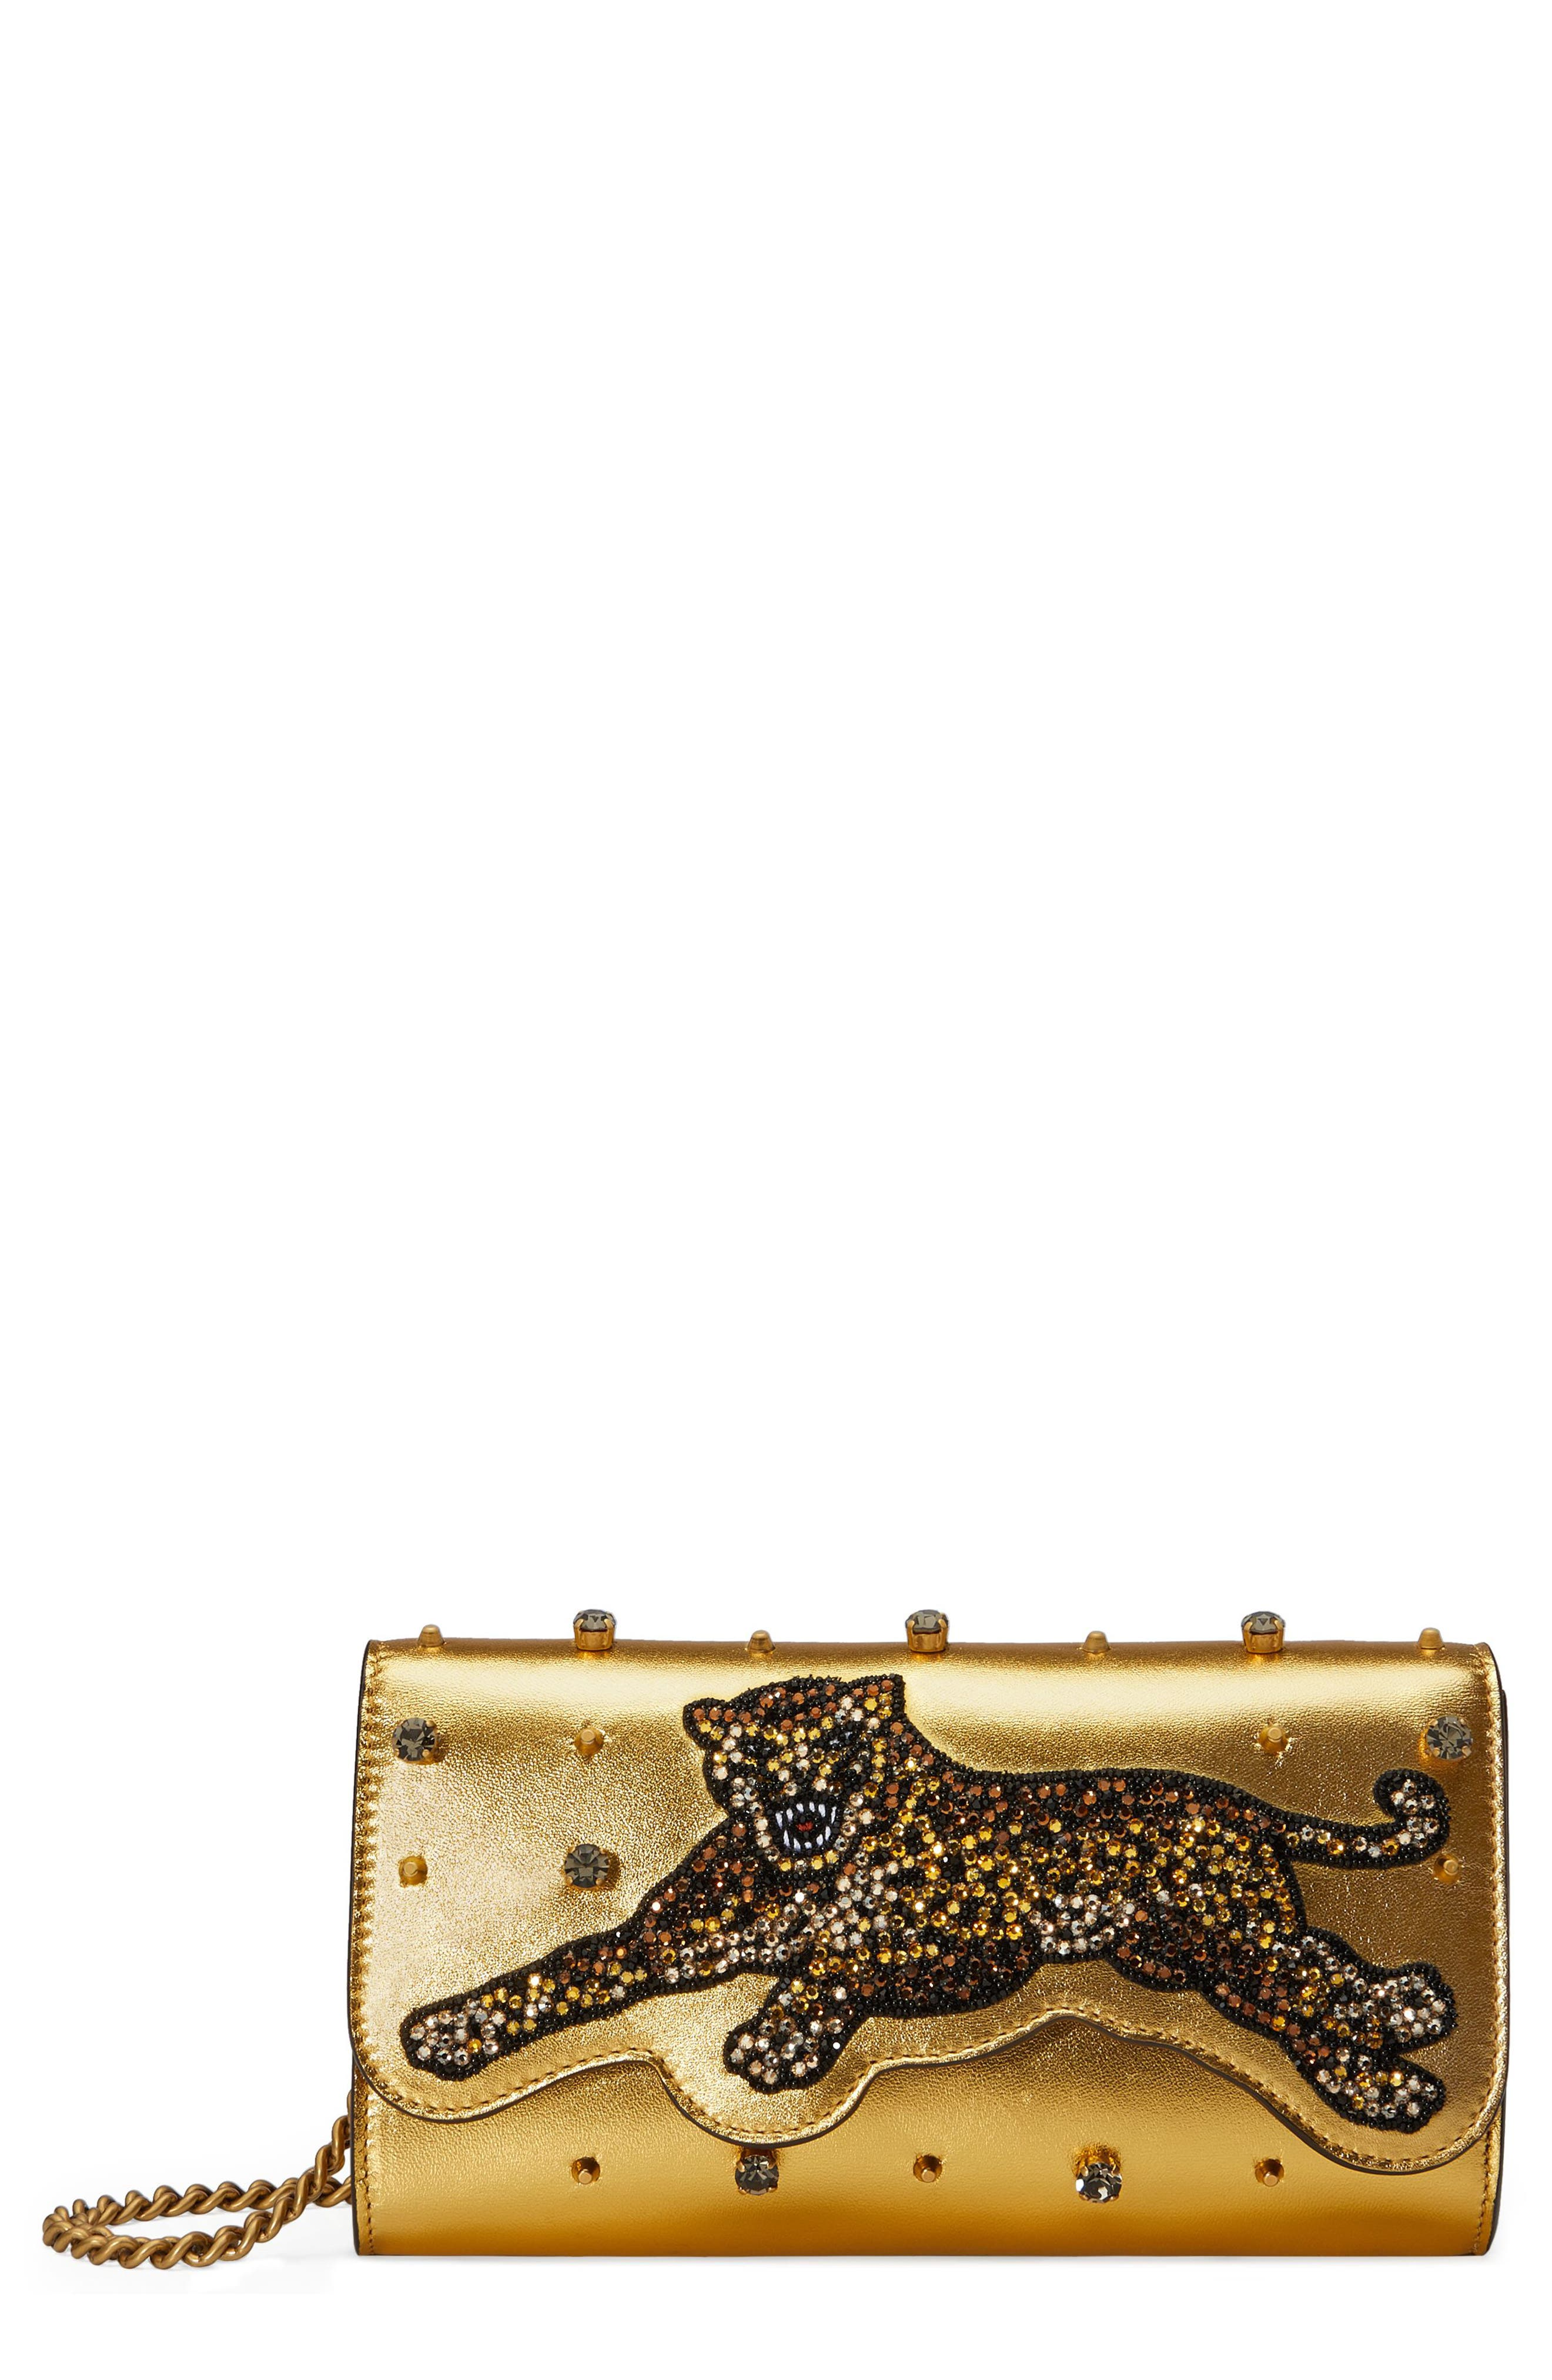 Alternate Image 1 Selected - Gucci Broadway Metallic Leather Shoulder Bag